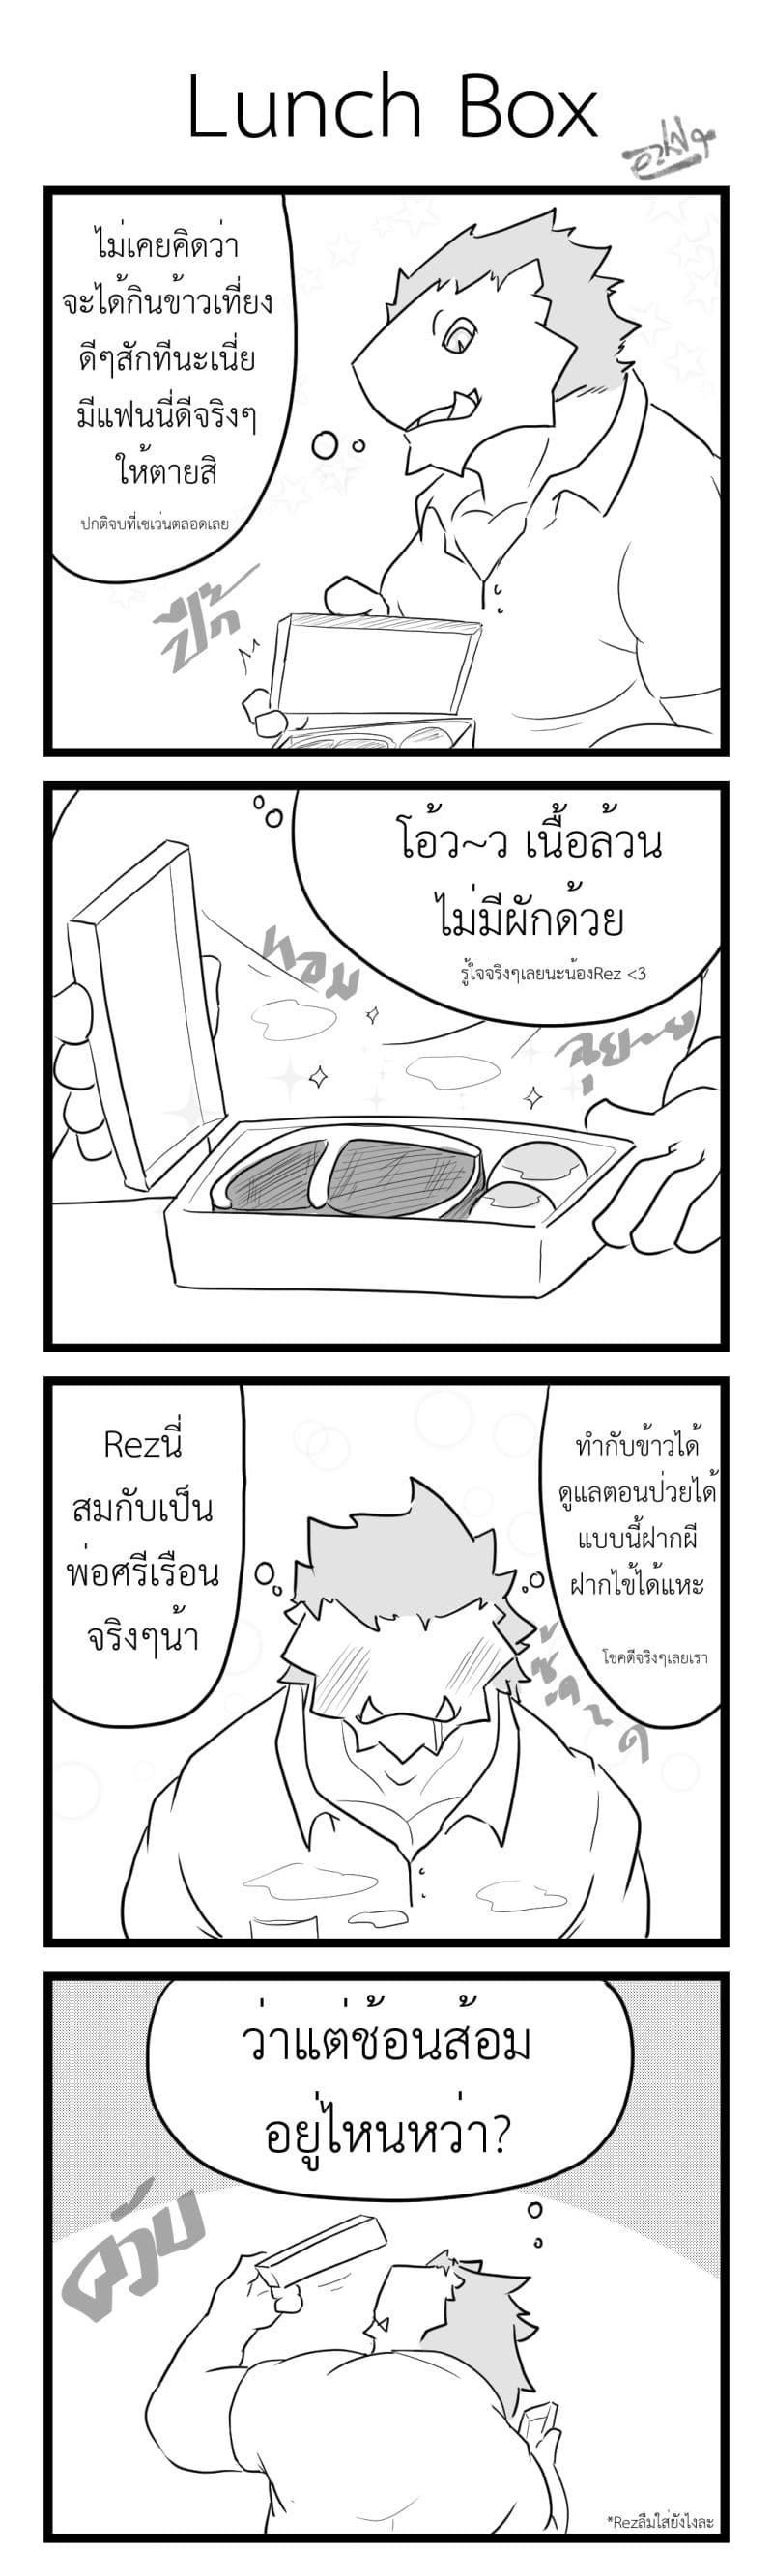 288 - Lunch Box